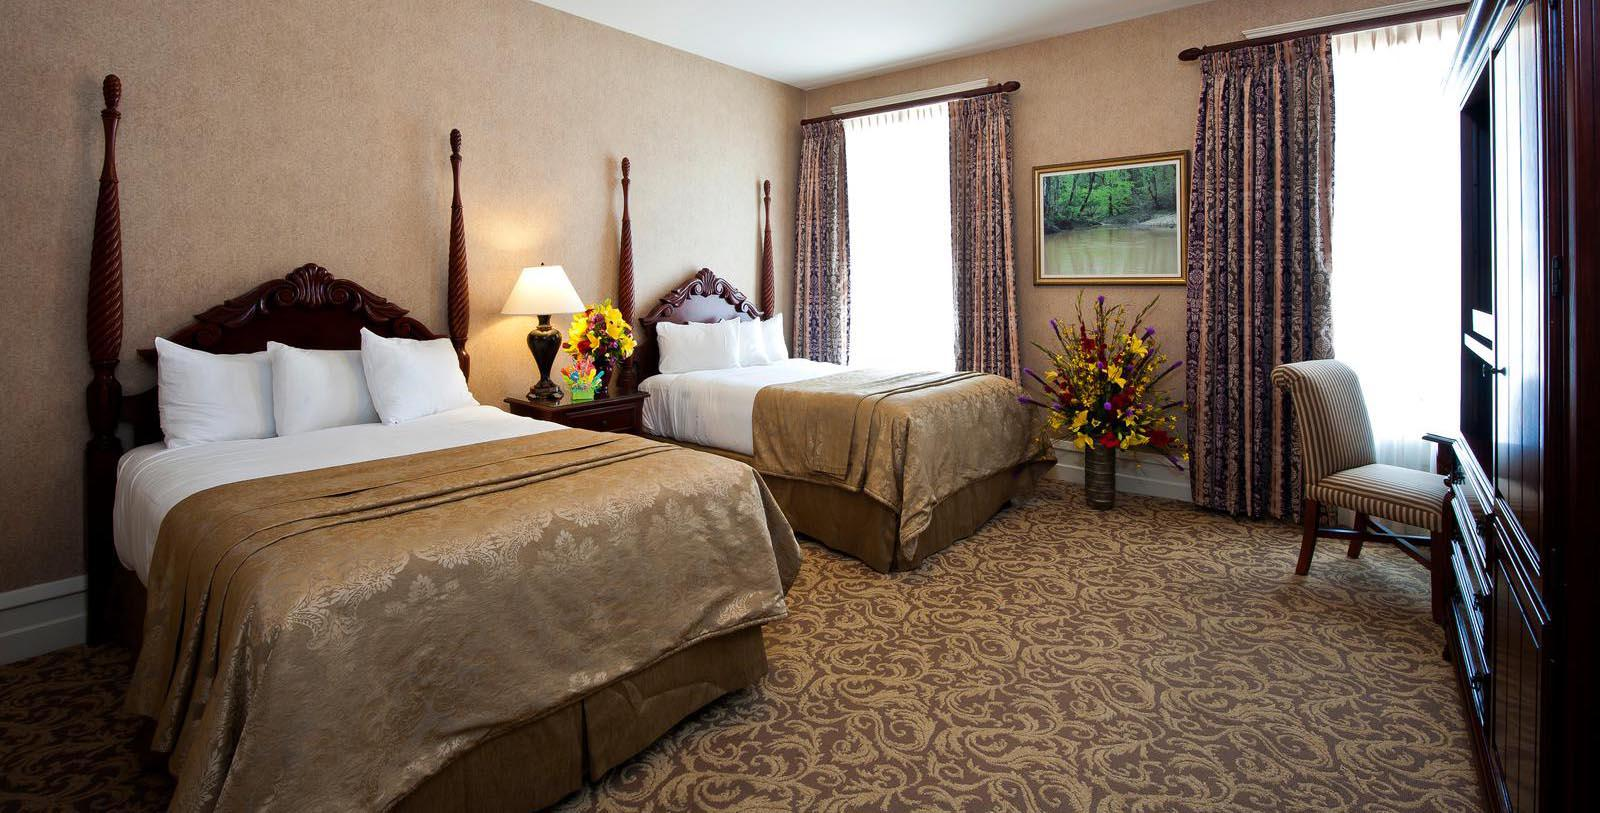 Image of guestroom West Baden Springs Hotel, 1902, Member of Historic Hotels of America, in West Baden Springs, Indiana, Location Map